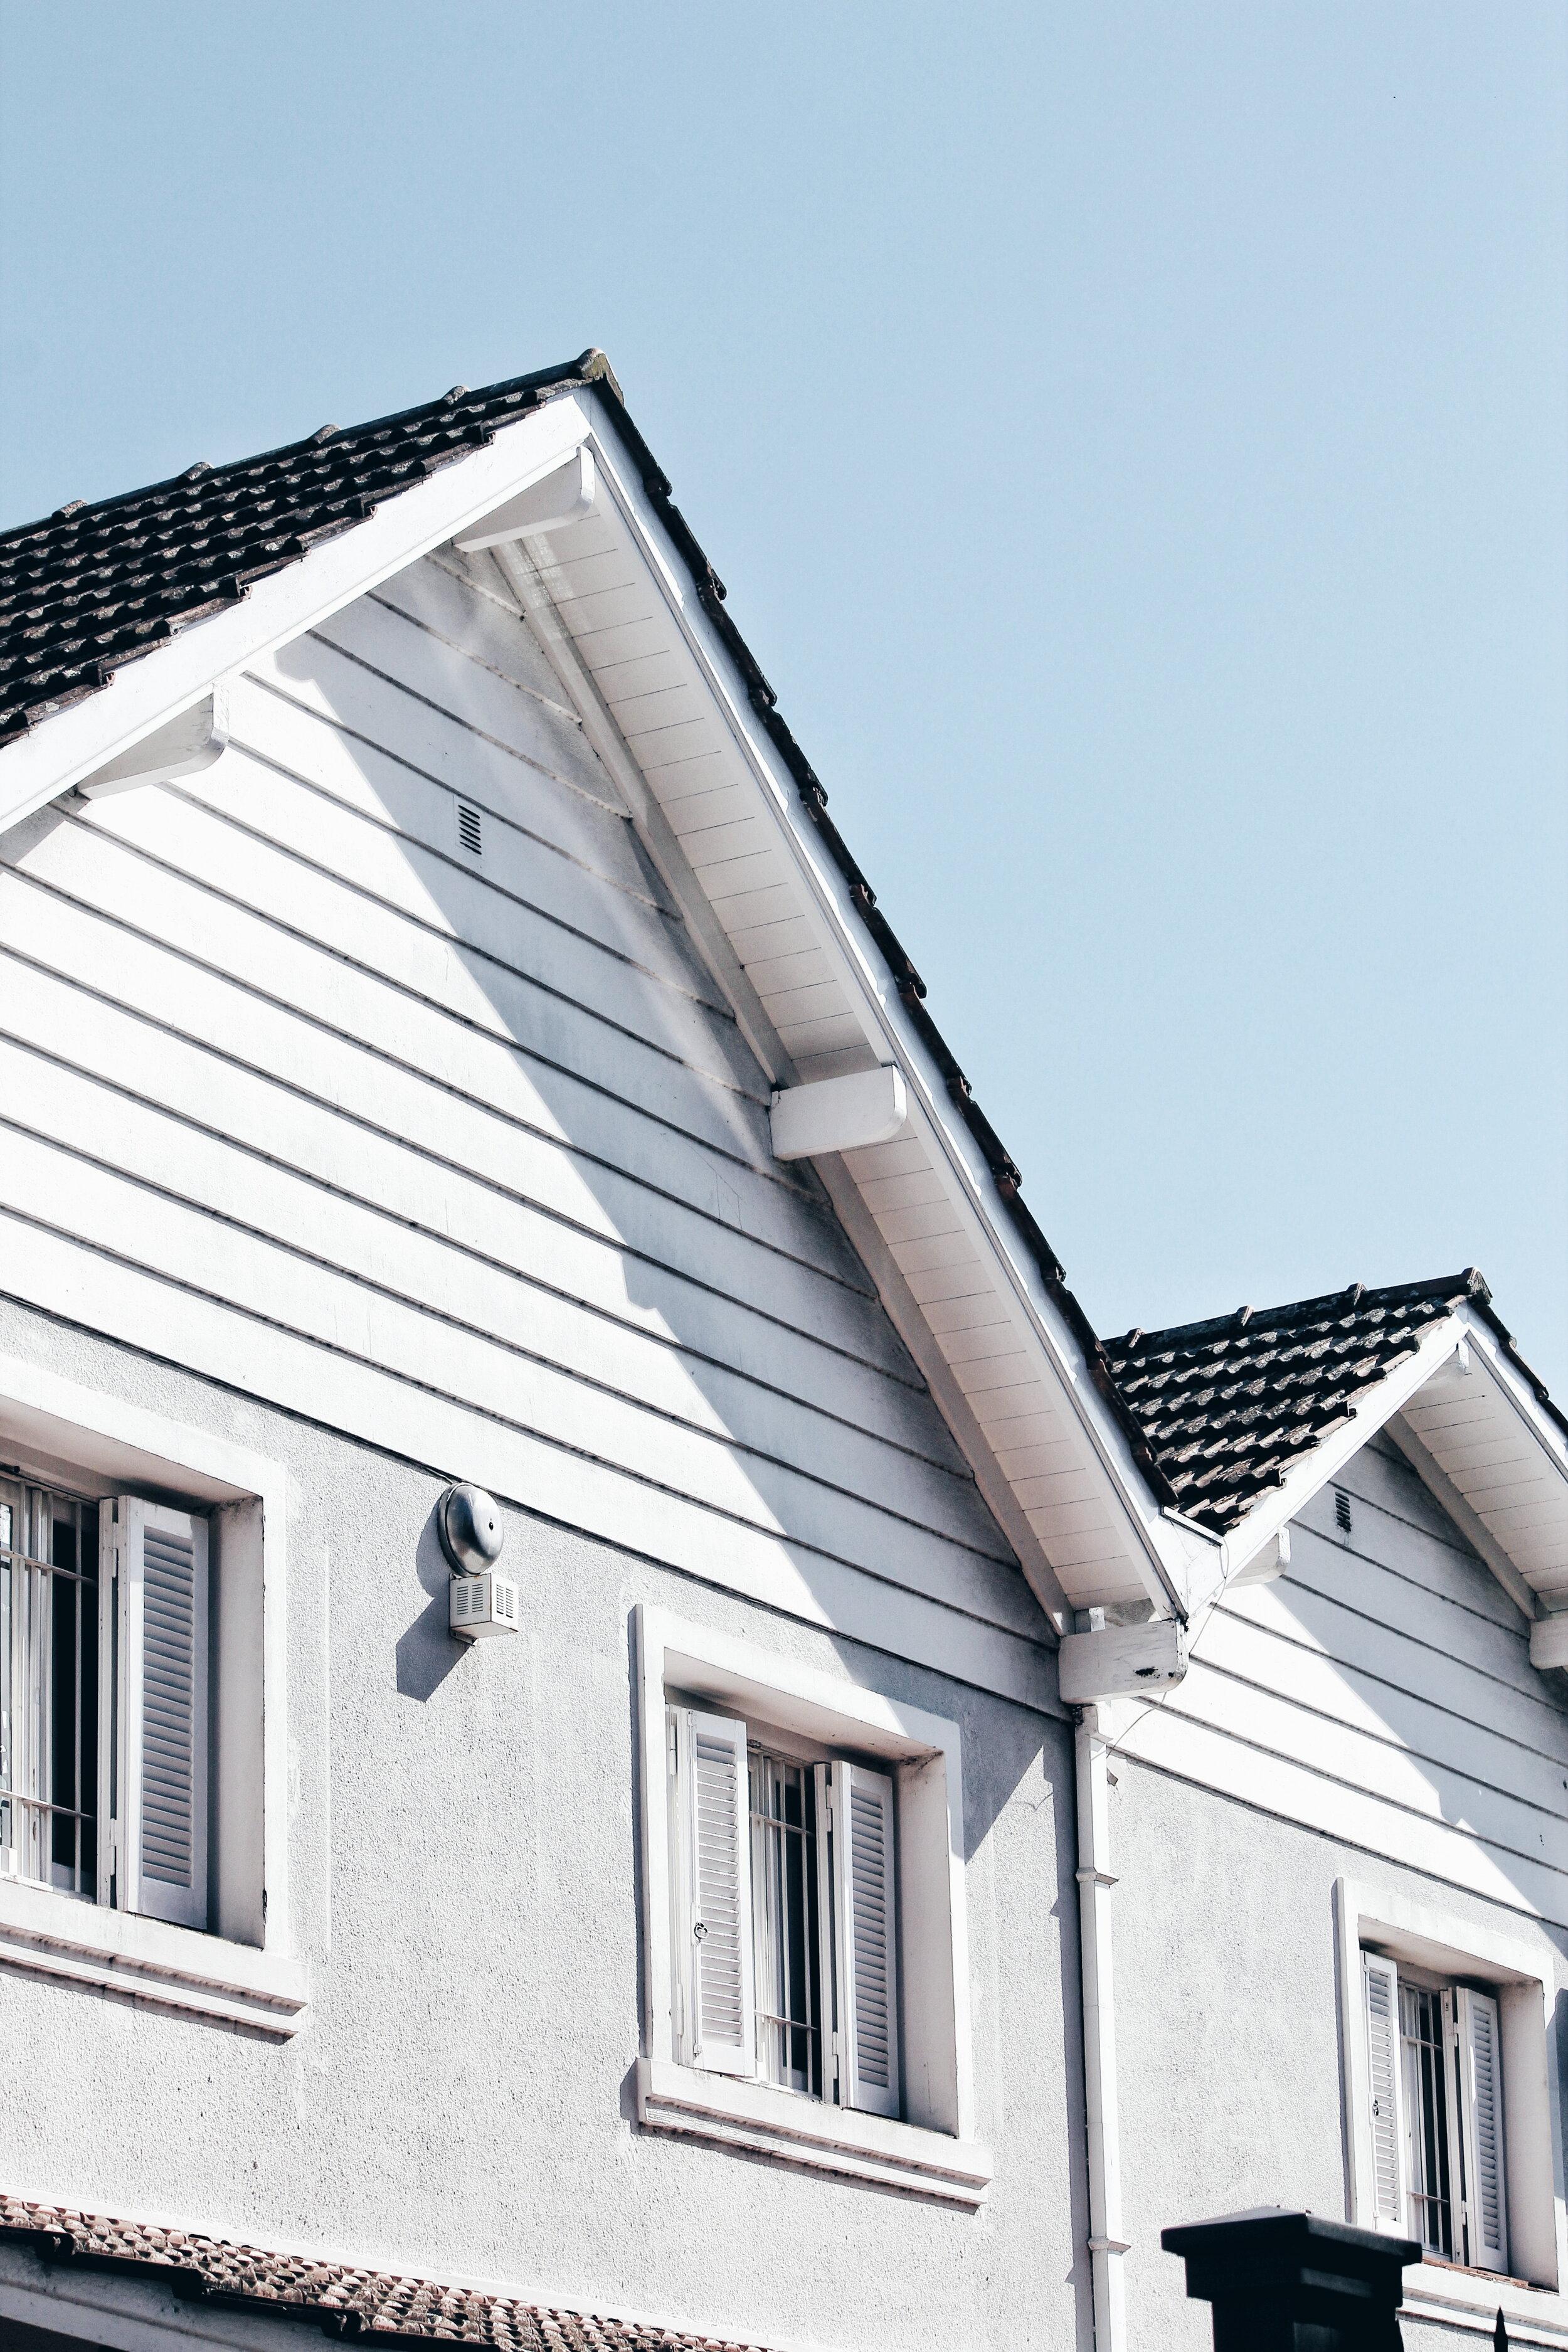 Real Estate Appraiser in Kirksville Missouri